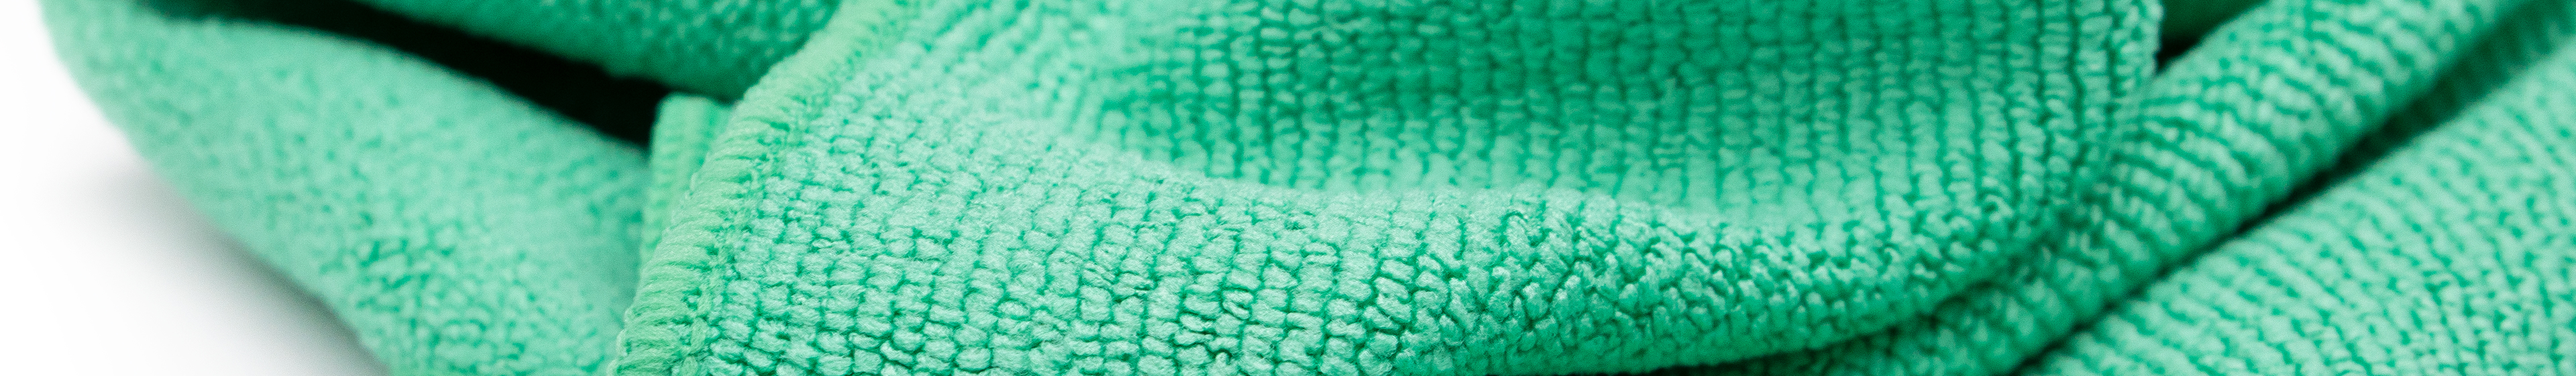 category-marketing-banner-towel-types-pearl-web.jpg